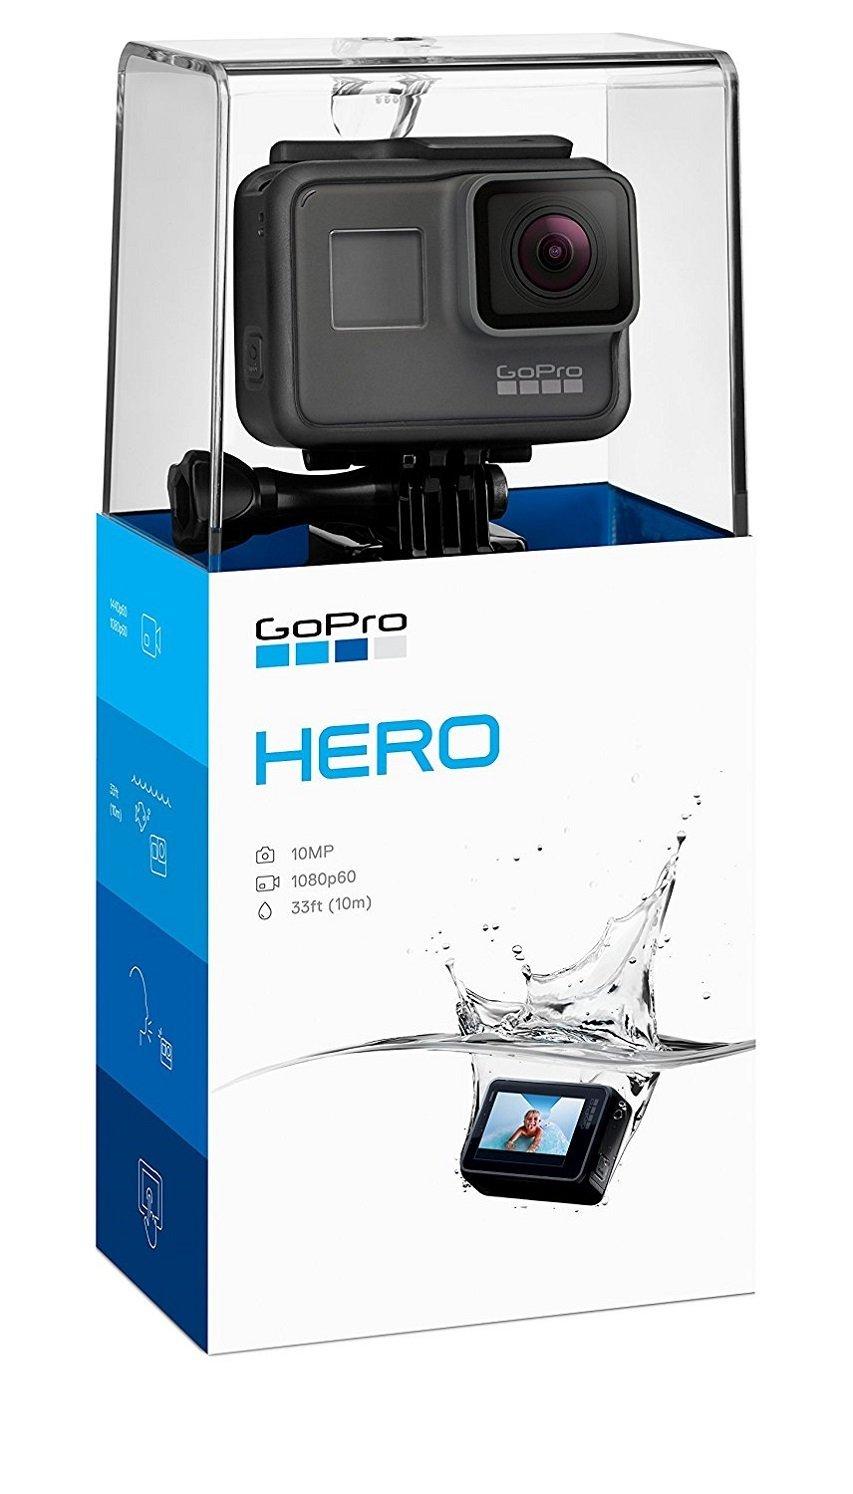 Câmera Digital GoPro Hero 2018 1080p CHDHB-501-RW